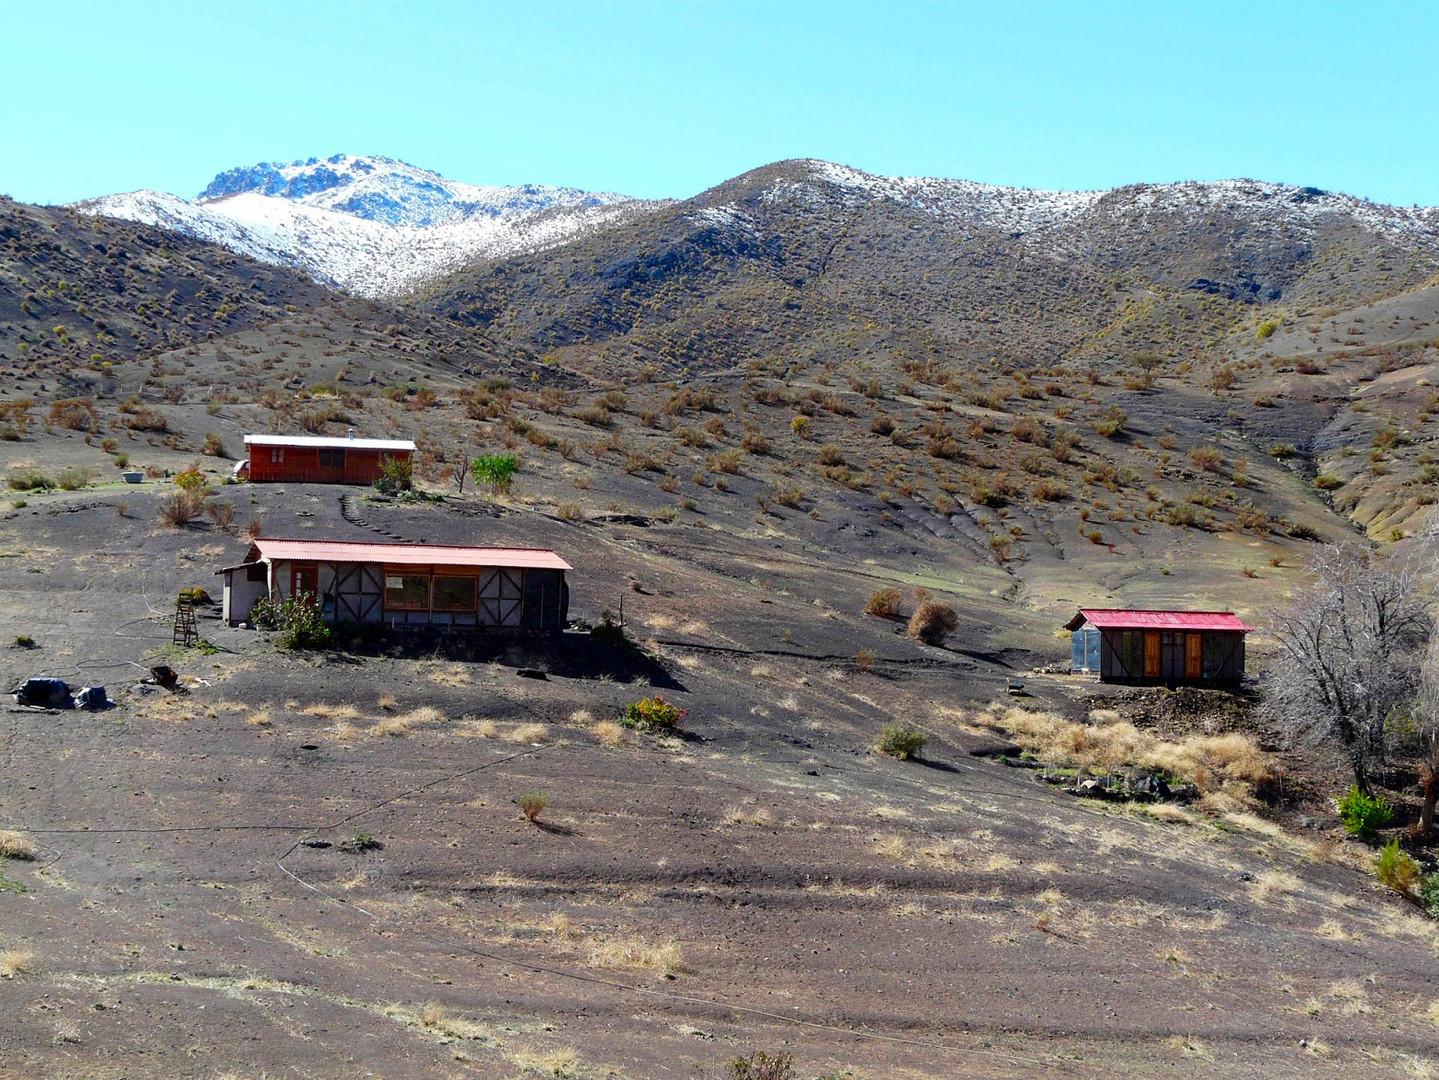 Séjour d'astronomie au Chili Cap Astro Evasion - 17